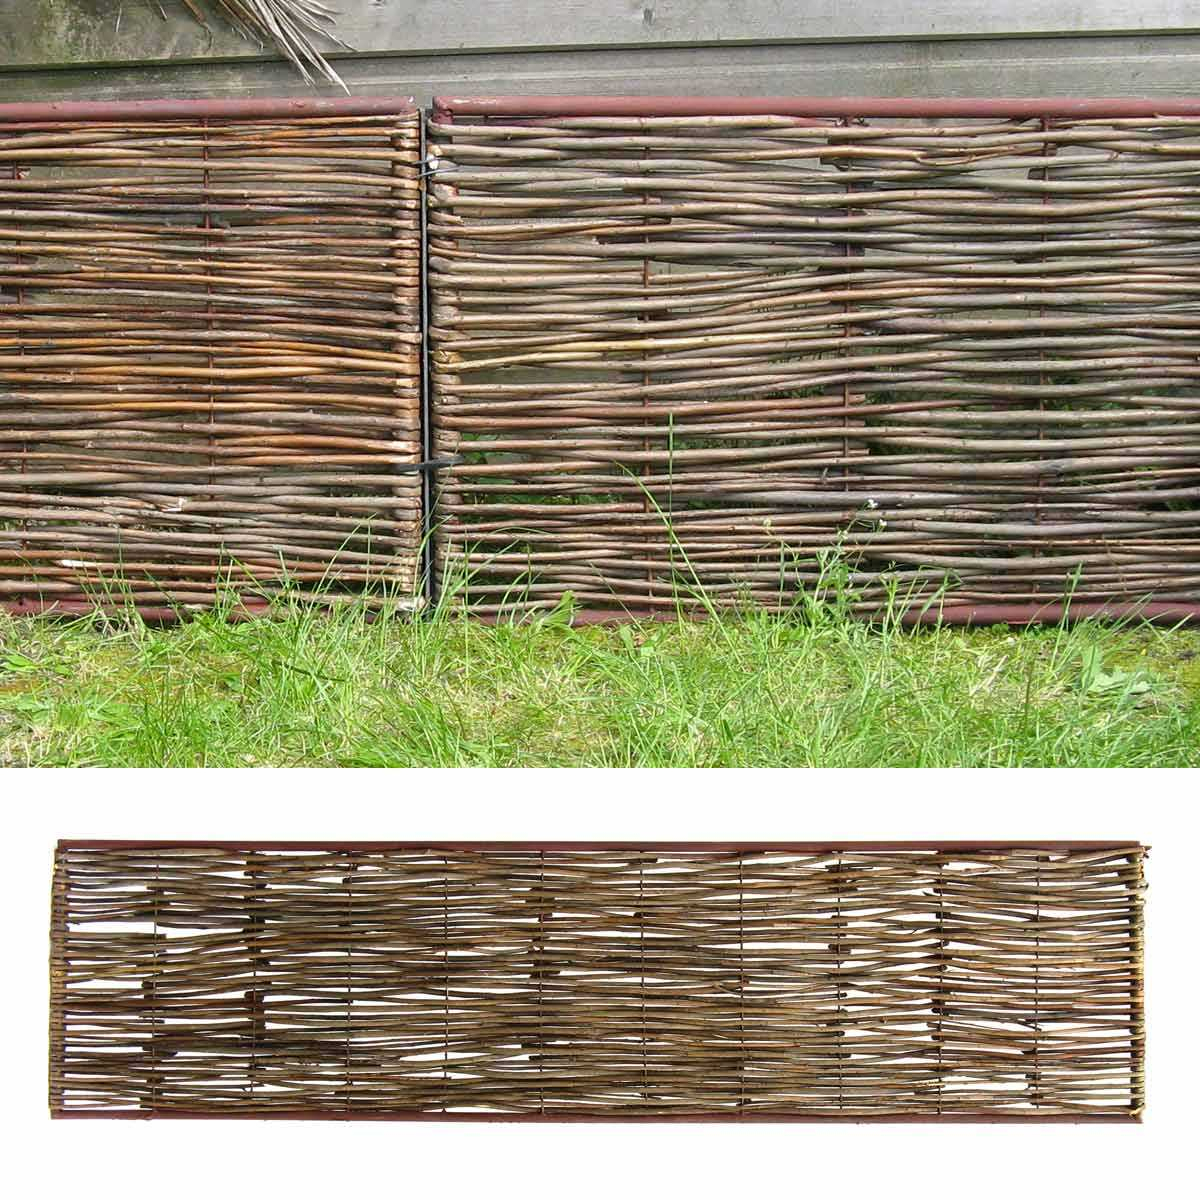 Bordure Médiévale Bois Acacia - Cadre Métal Haut.45Cm + Tige concernant Bordure Jardin Metal